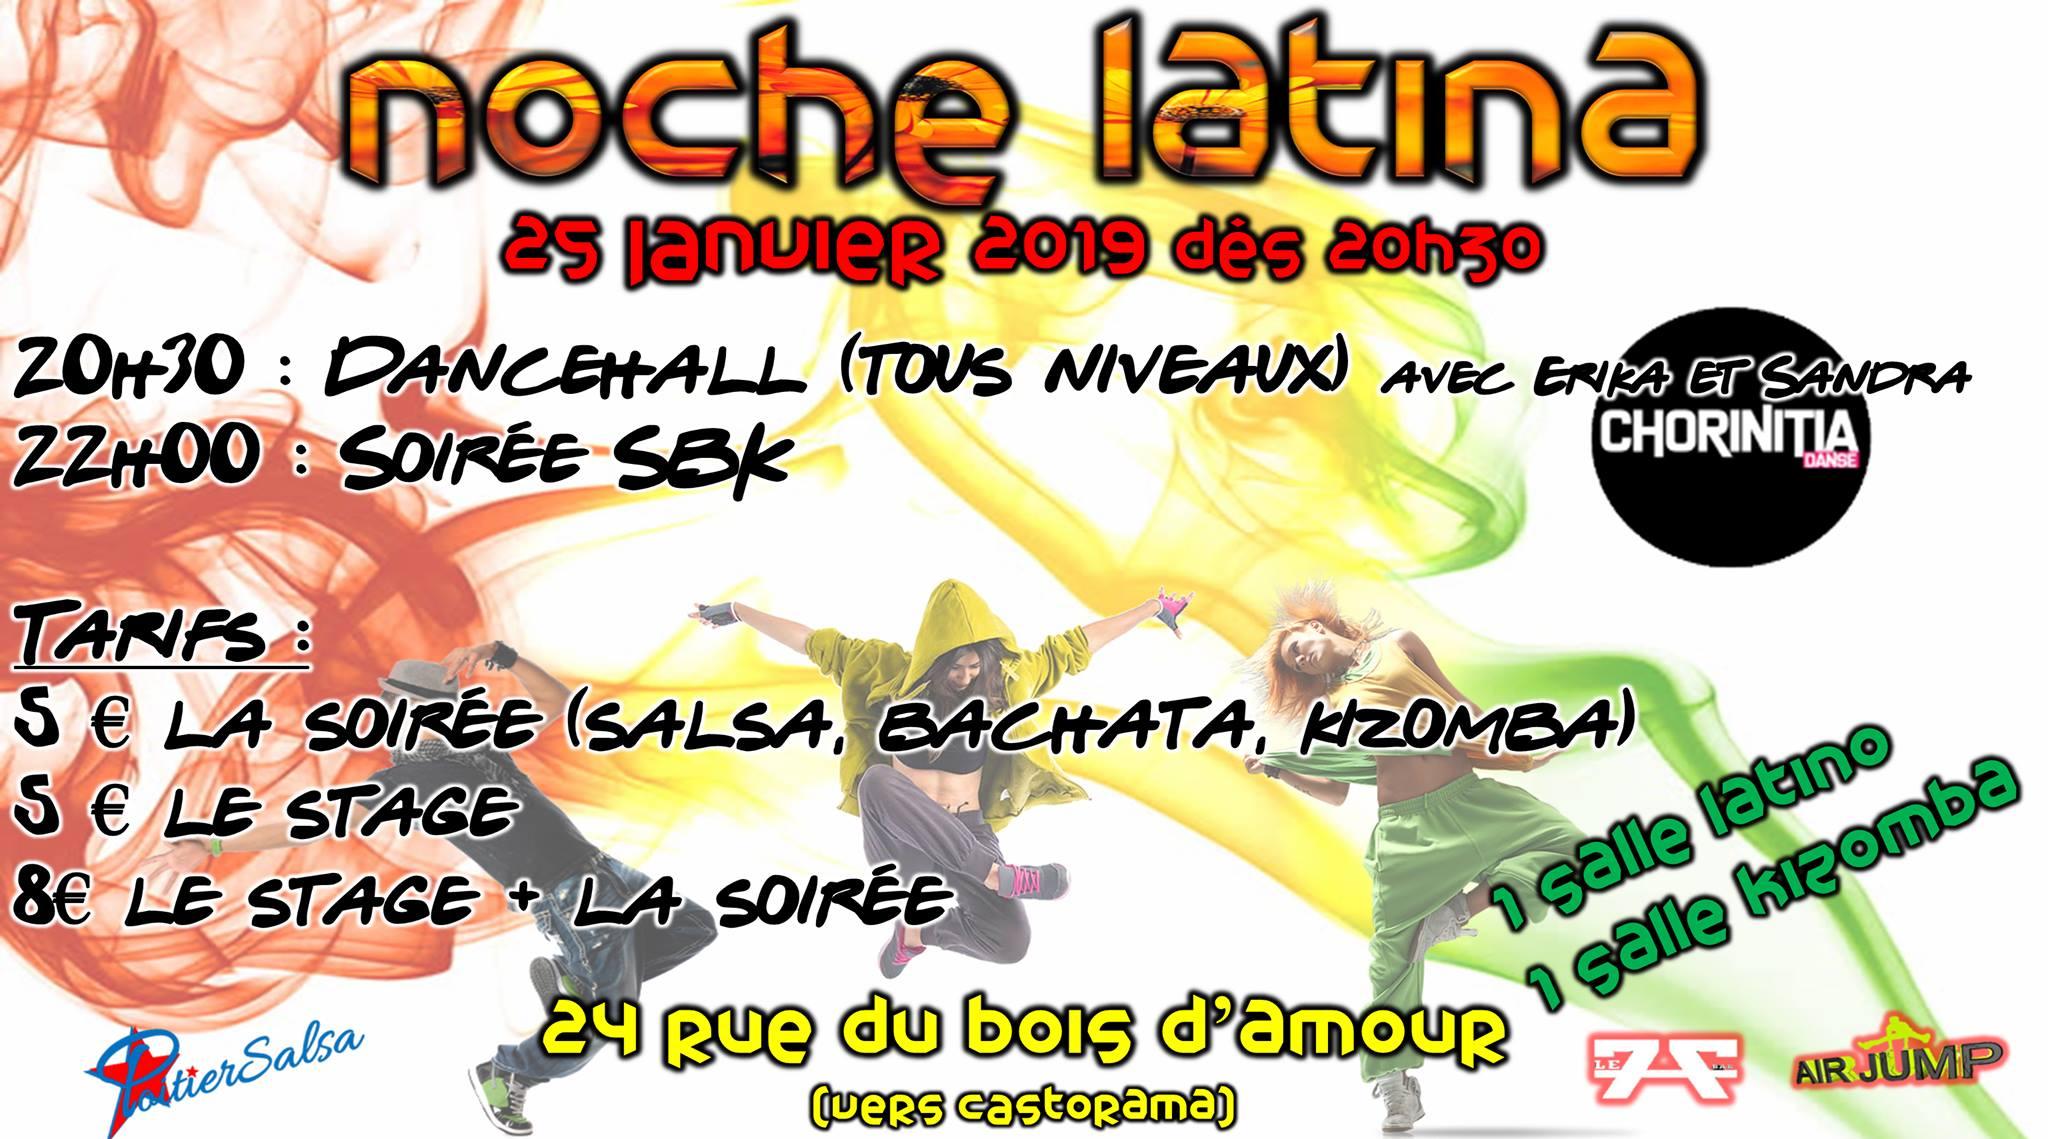 Noche Latina du 25 janvier